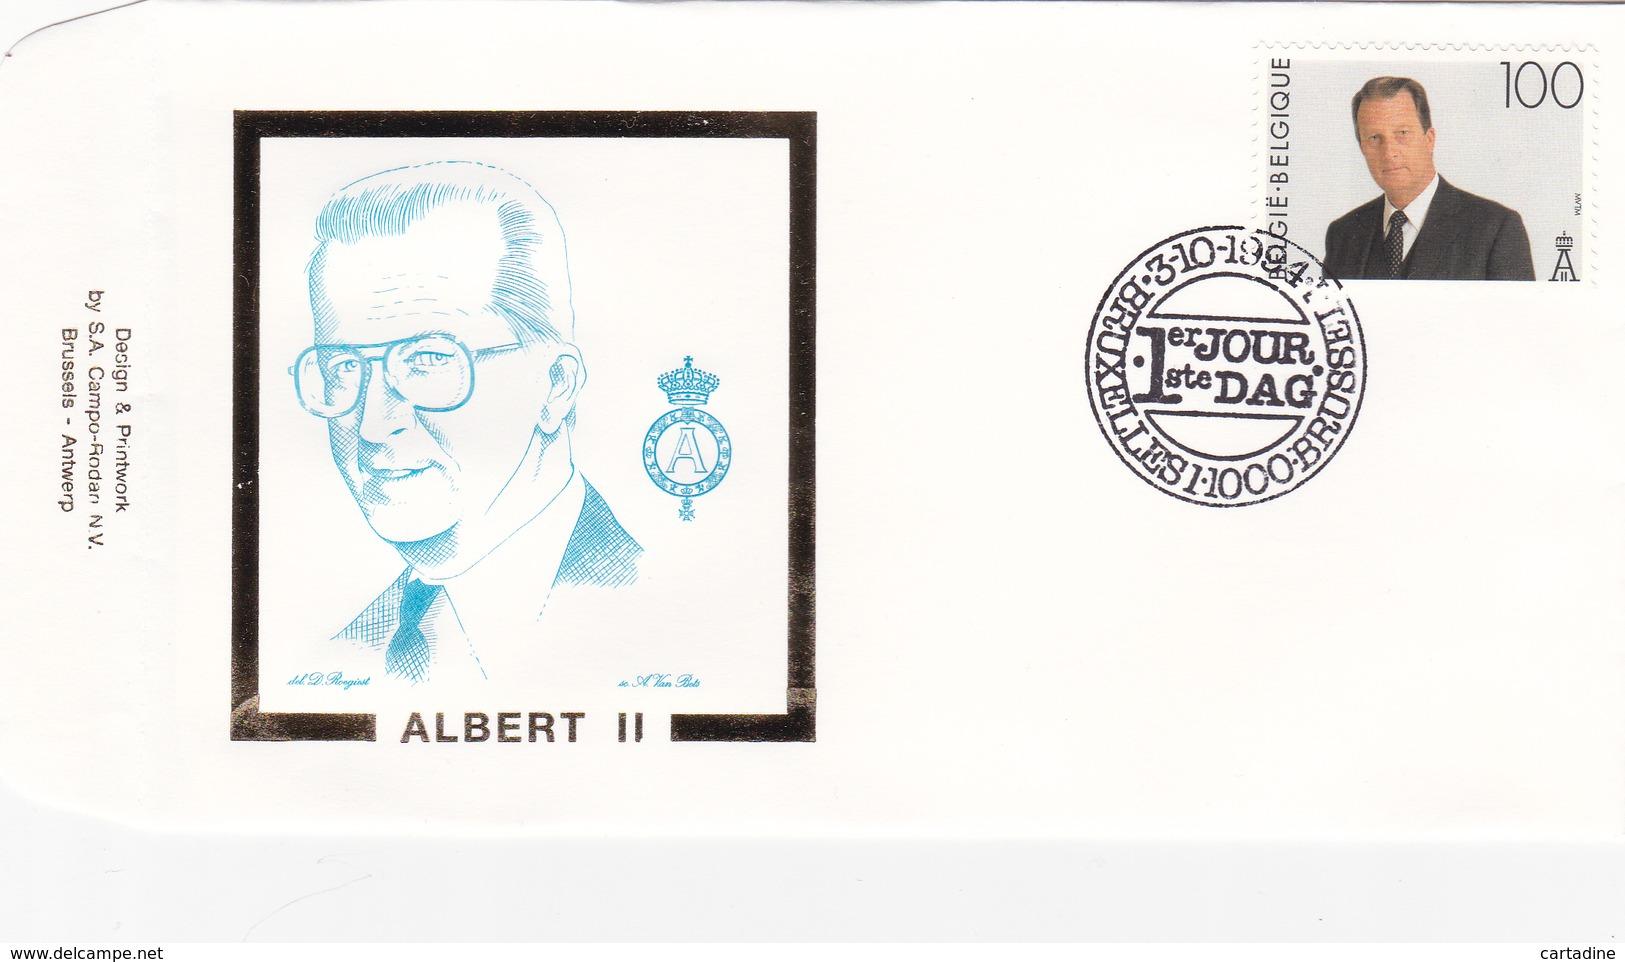 ALBERT II - Premier Jour -  Timbre N° 2576 - Sur Enveloppe - FDC